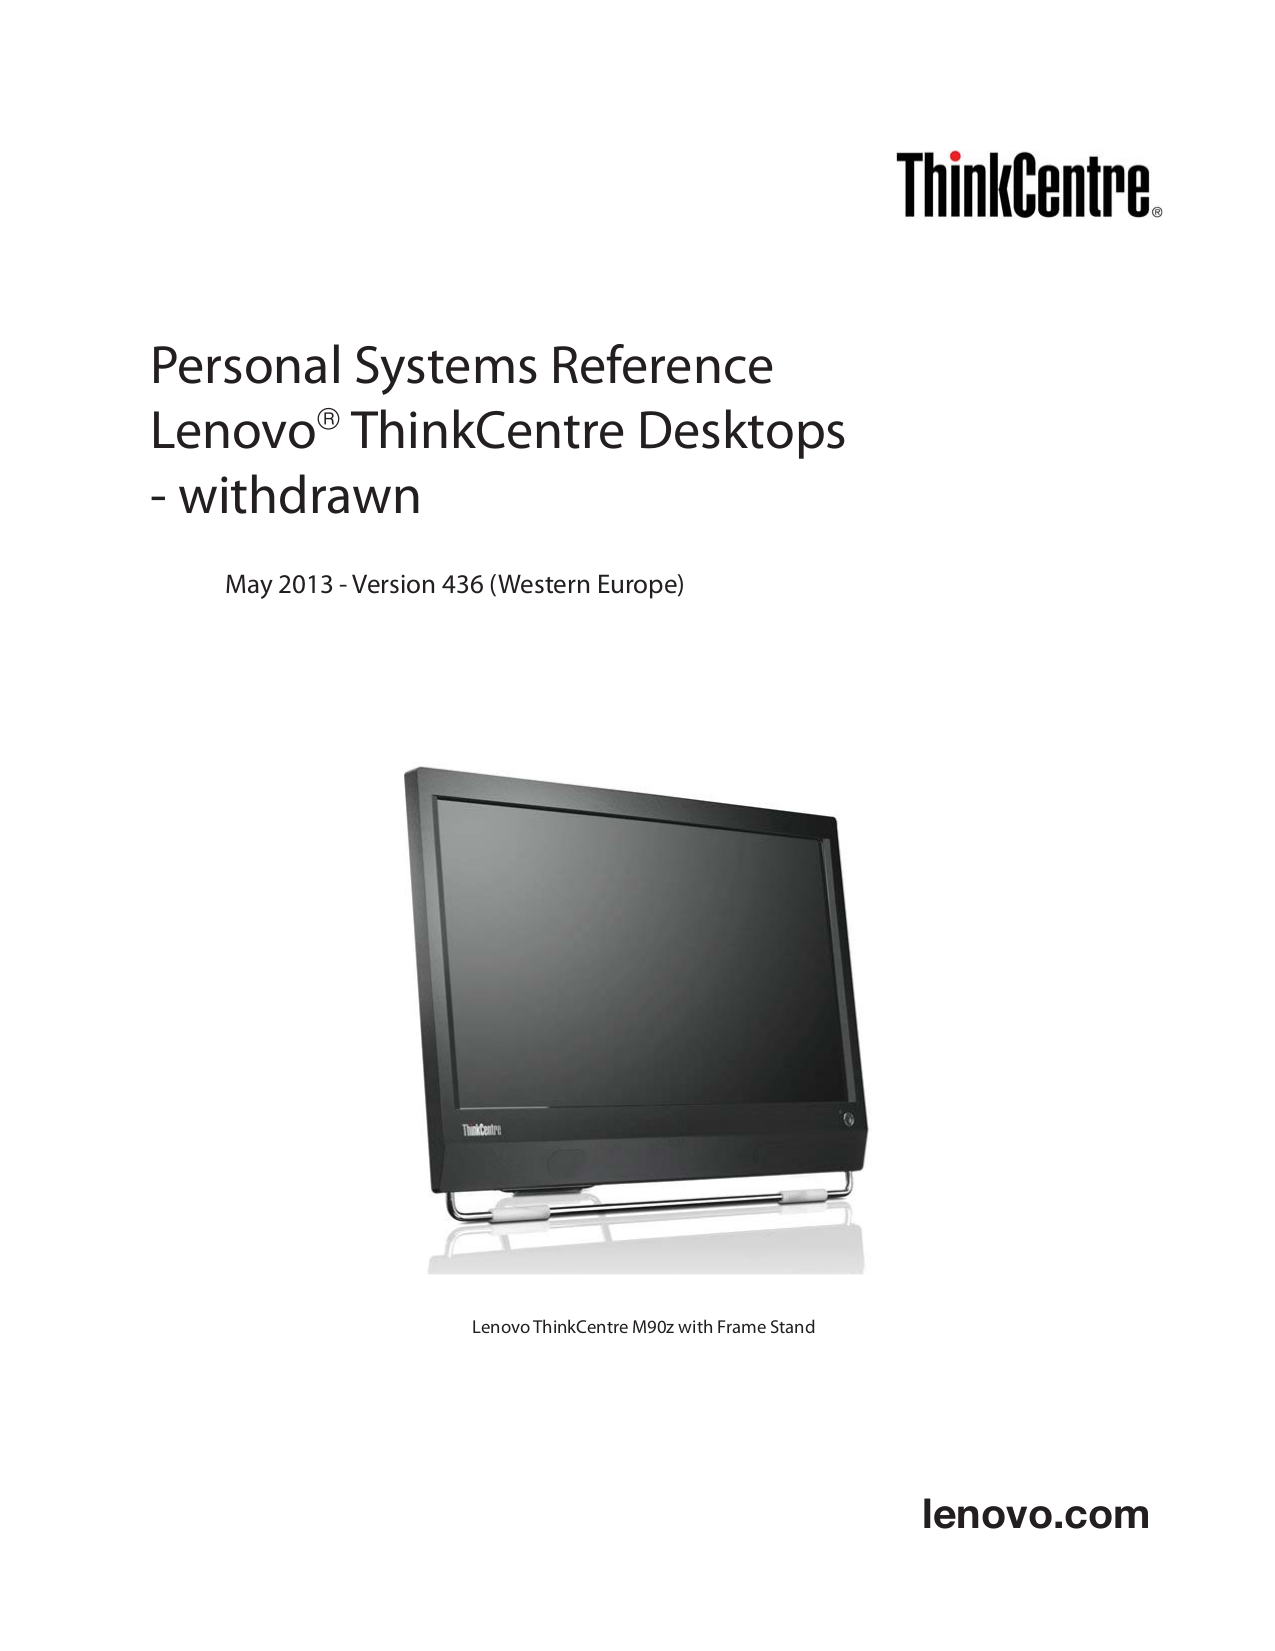 pdf for Lenovo Desktop ThinkCentre M90z 5205 manual